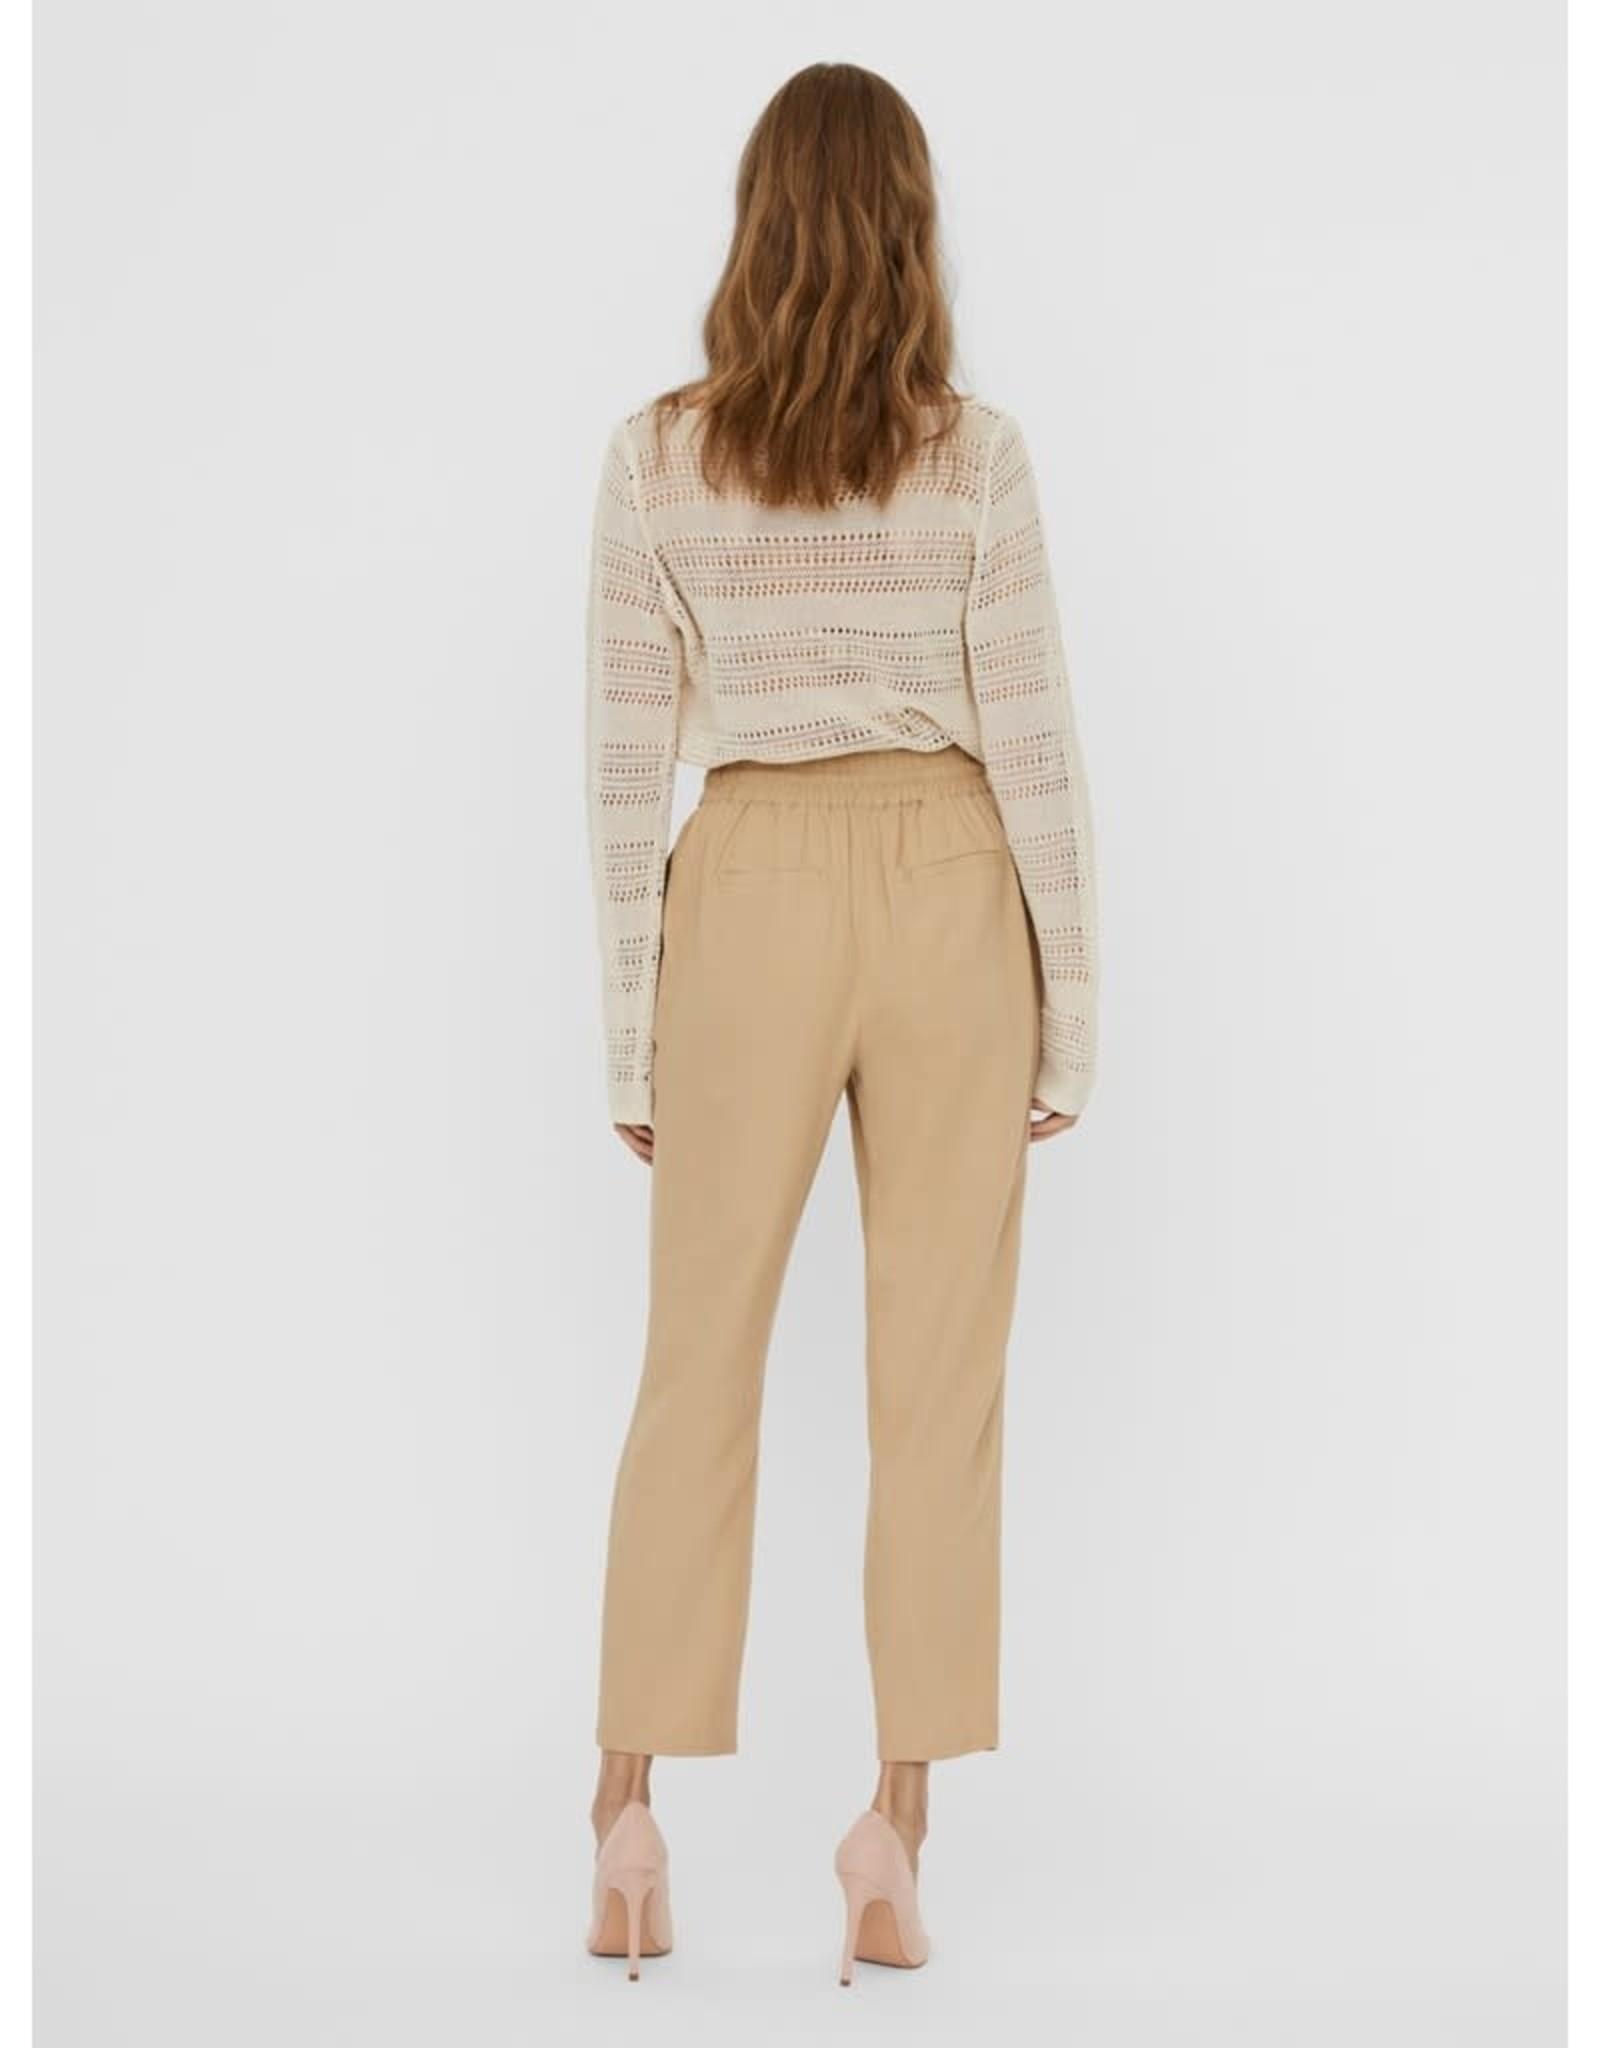 Vero Moda Astimilo Linen Dress Pant